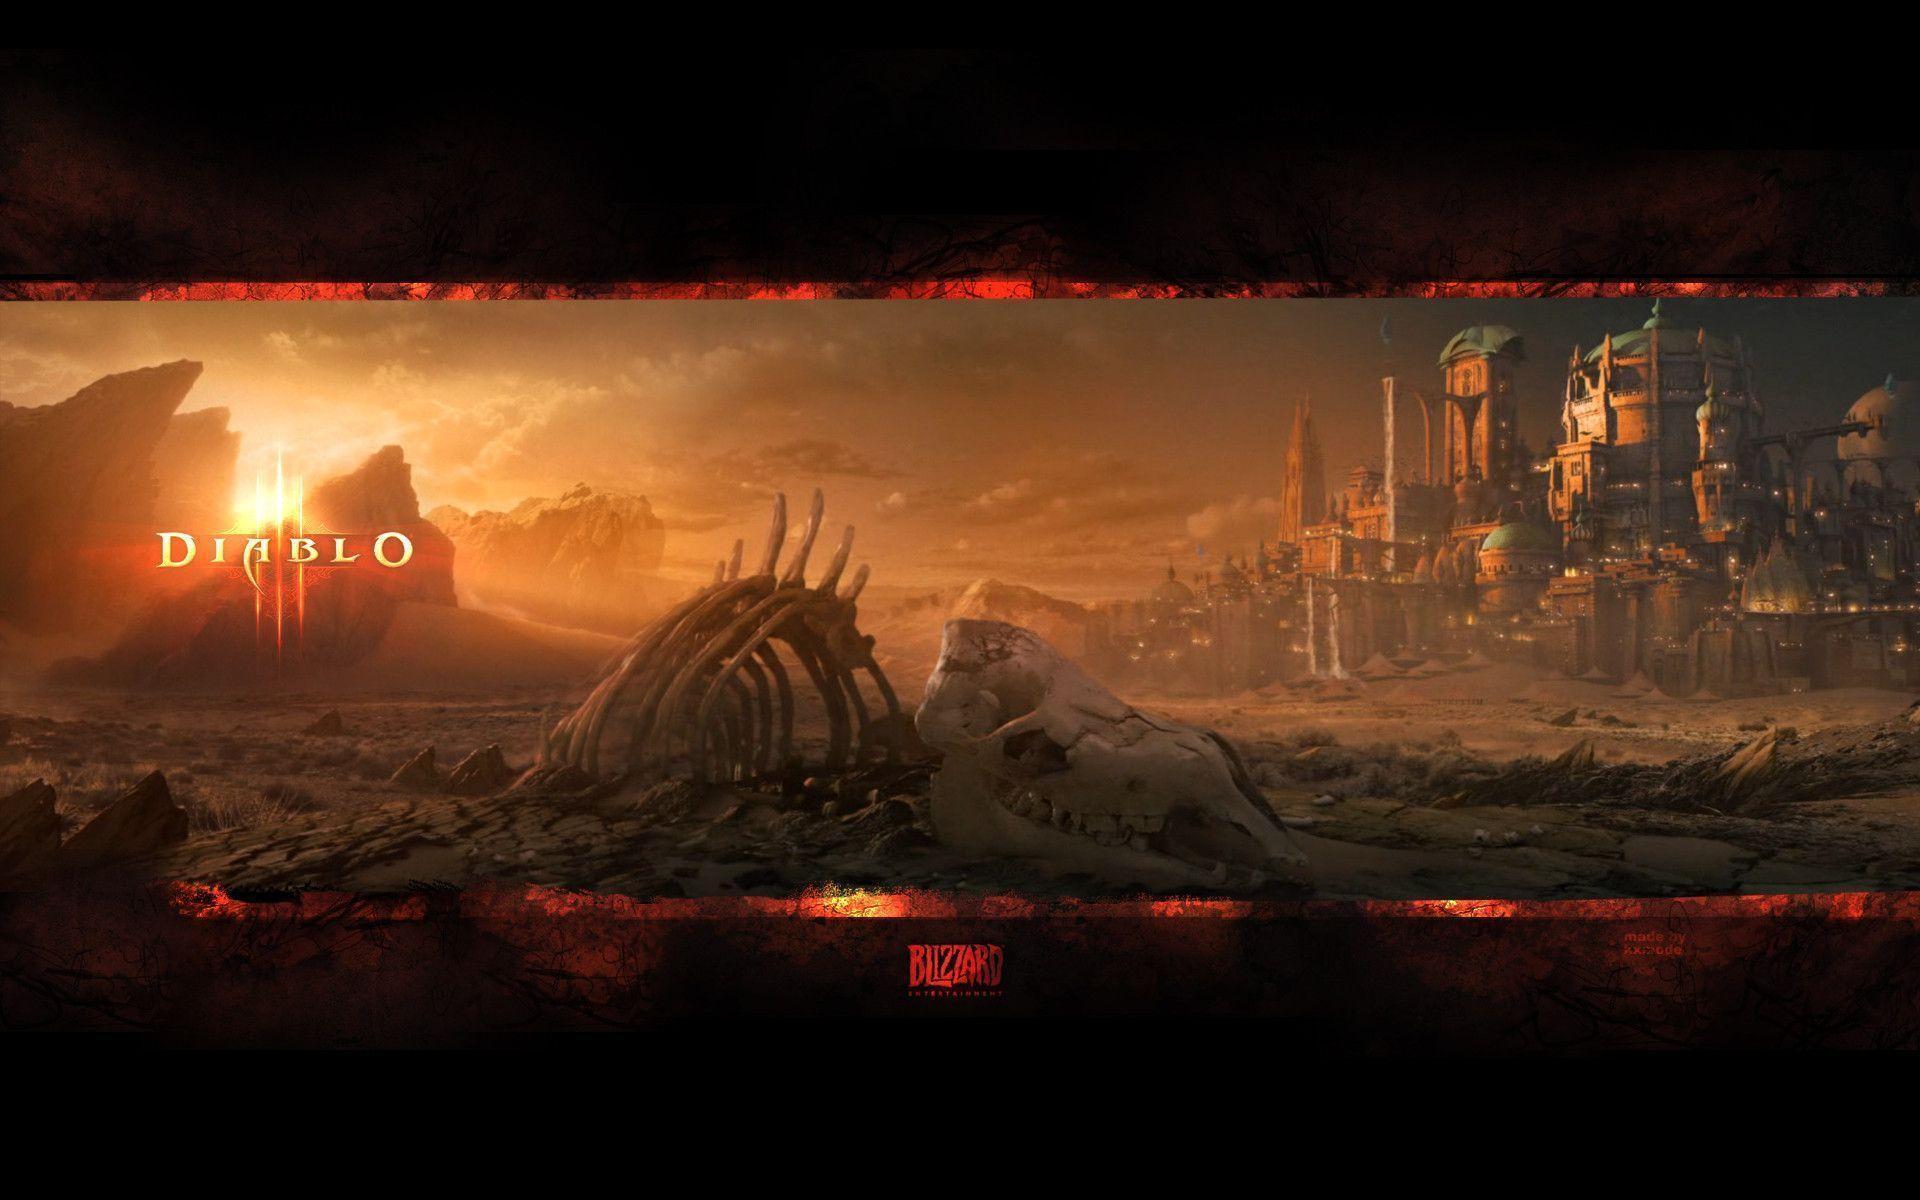 Diablo 3 Wallpaper Hd wallpaper - 876957